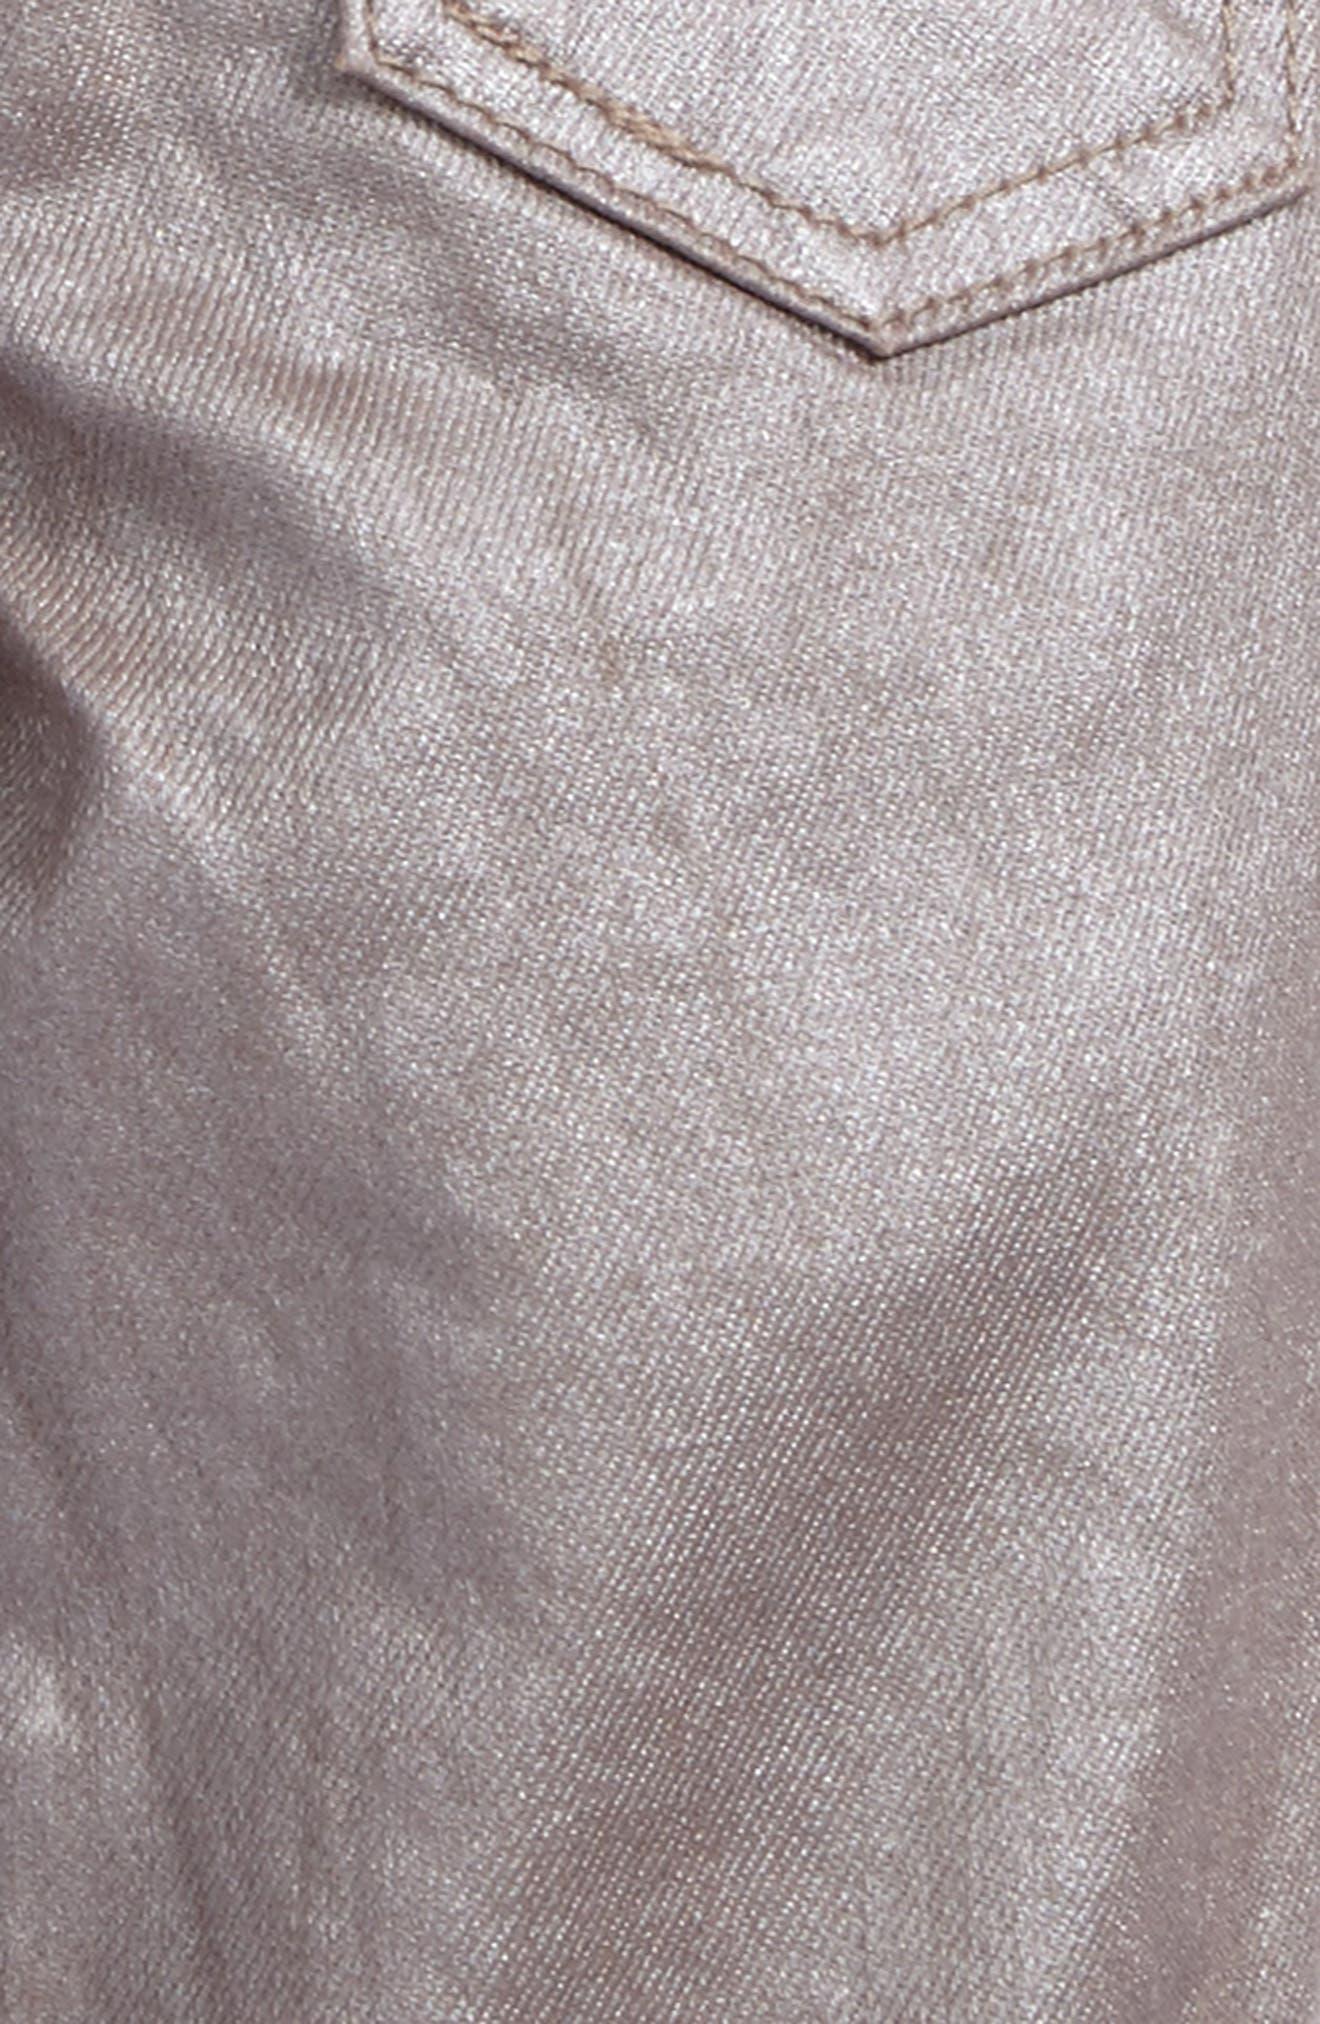 The Sleek Twiggy Super Skinny Jeans,                             Alternate thumbnail 3, color,                             692